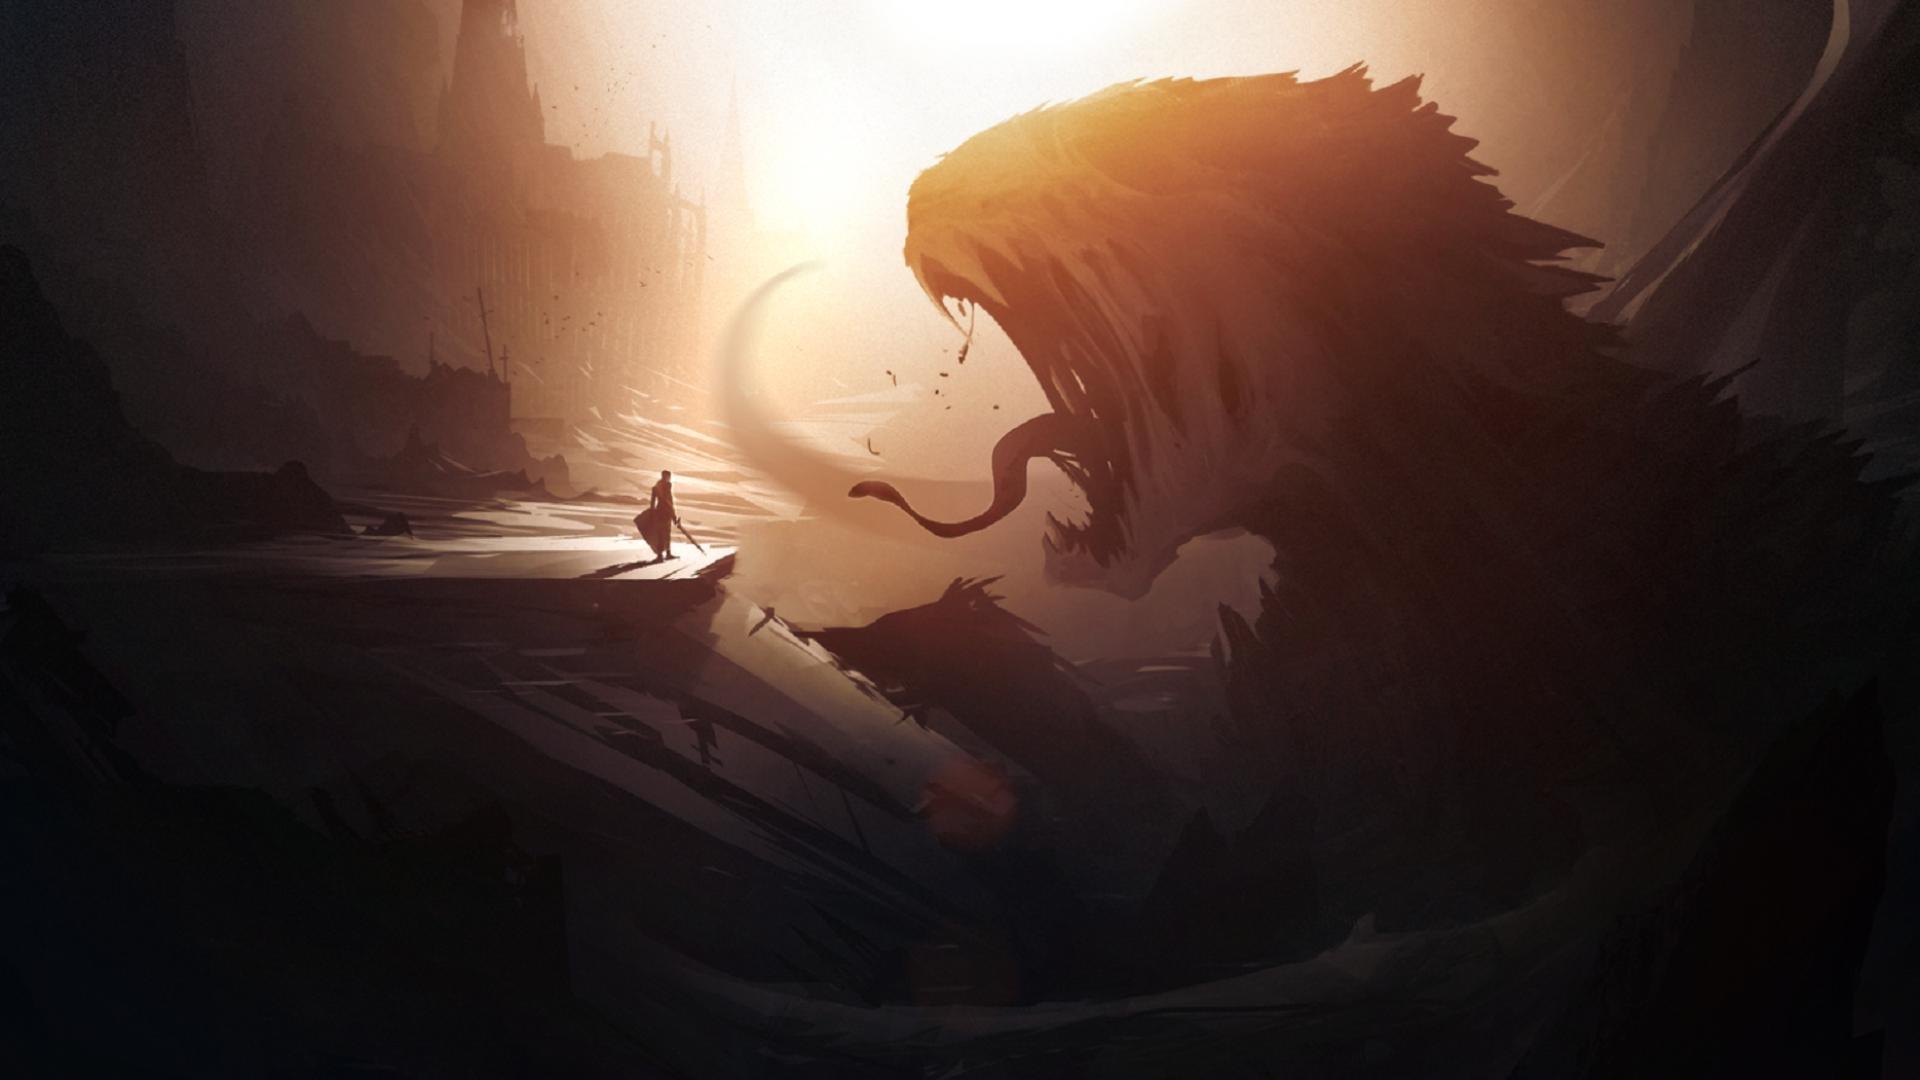 General 1920x1080 artwork fantasy art digital art warrior creature mountains